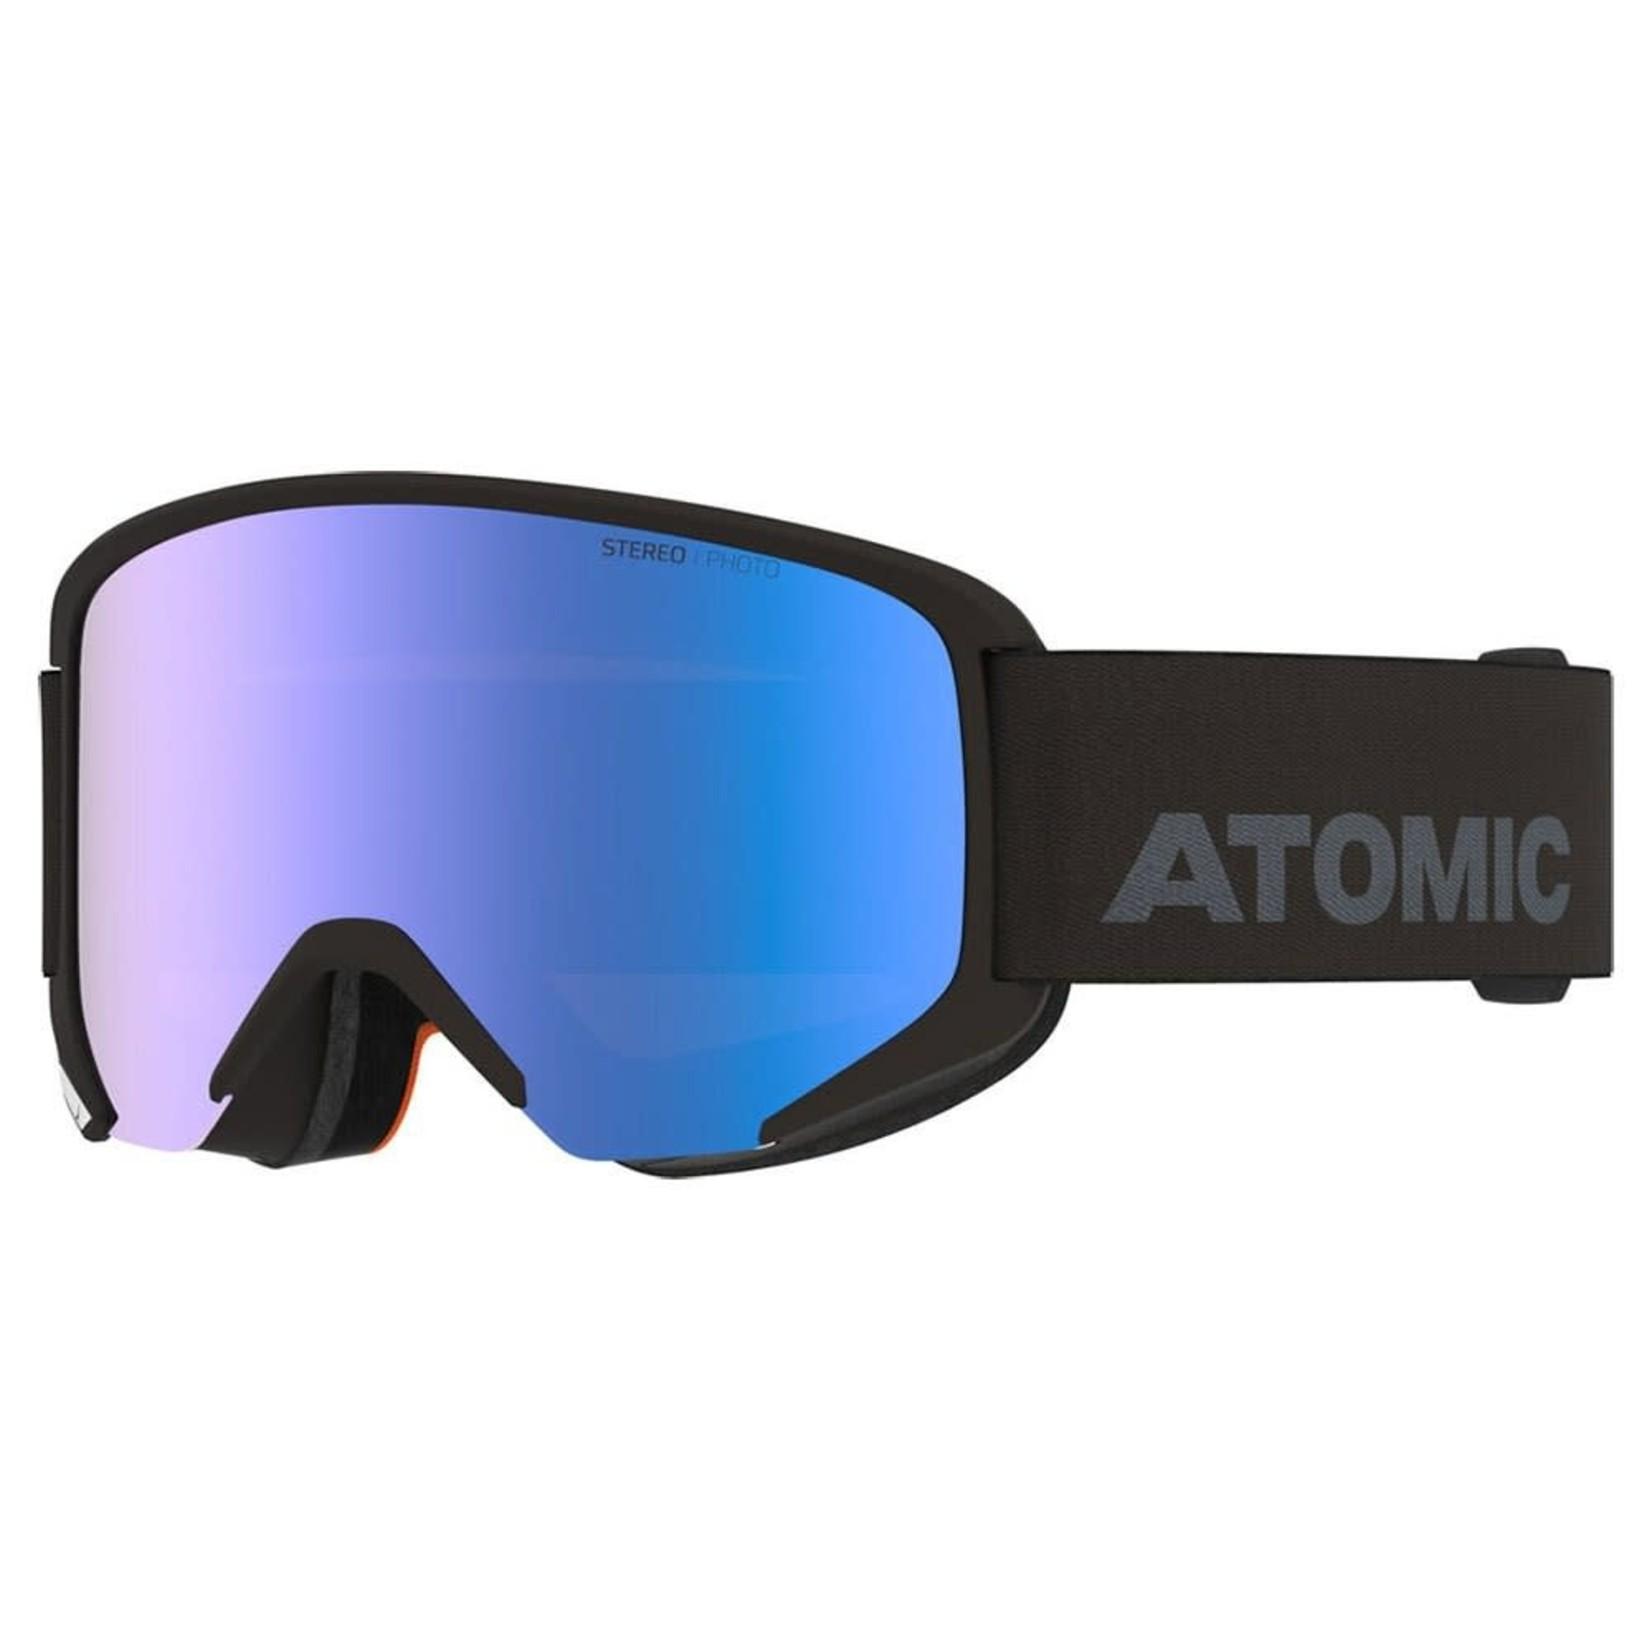 Atomic Atomic Savor Photo Goggles - Unisex